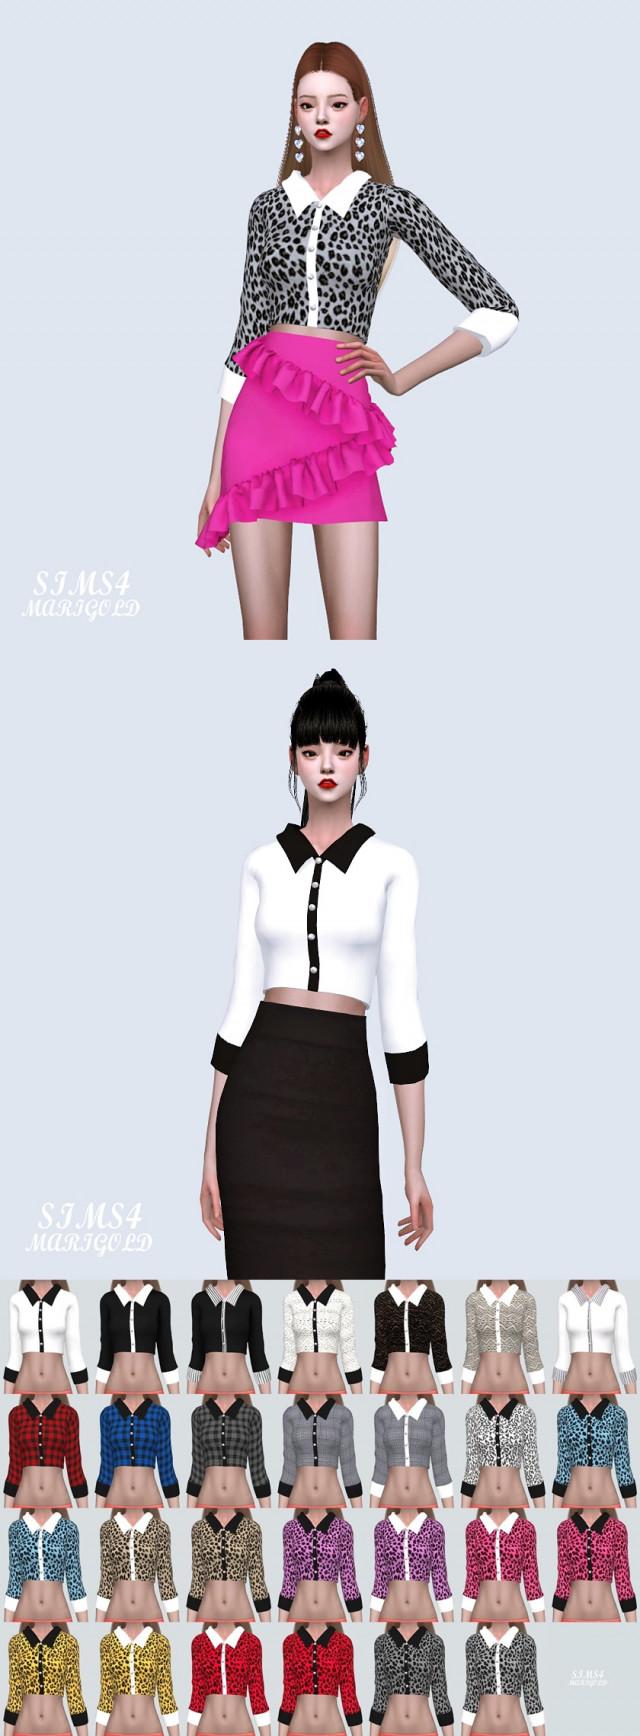 Женская повседневная одежда 58ae7e34ede89e3baa8eed55c5377308